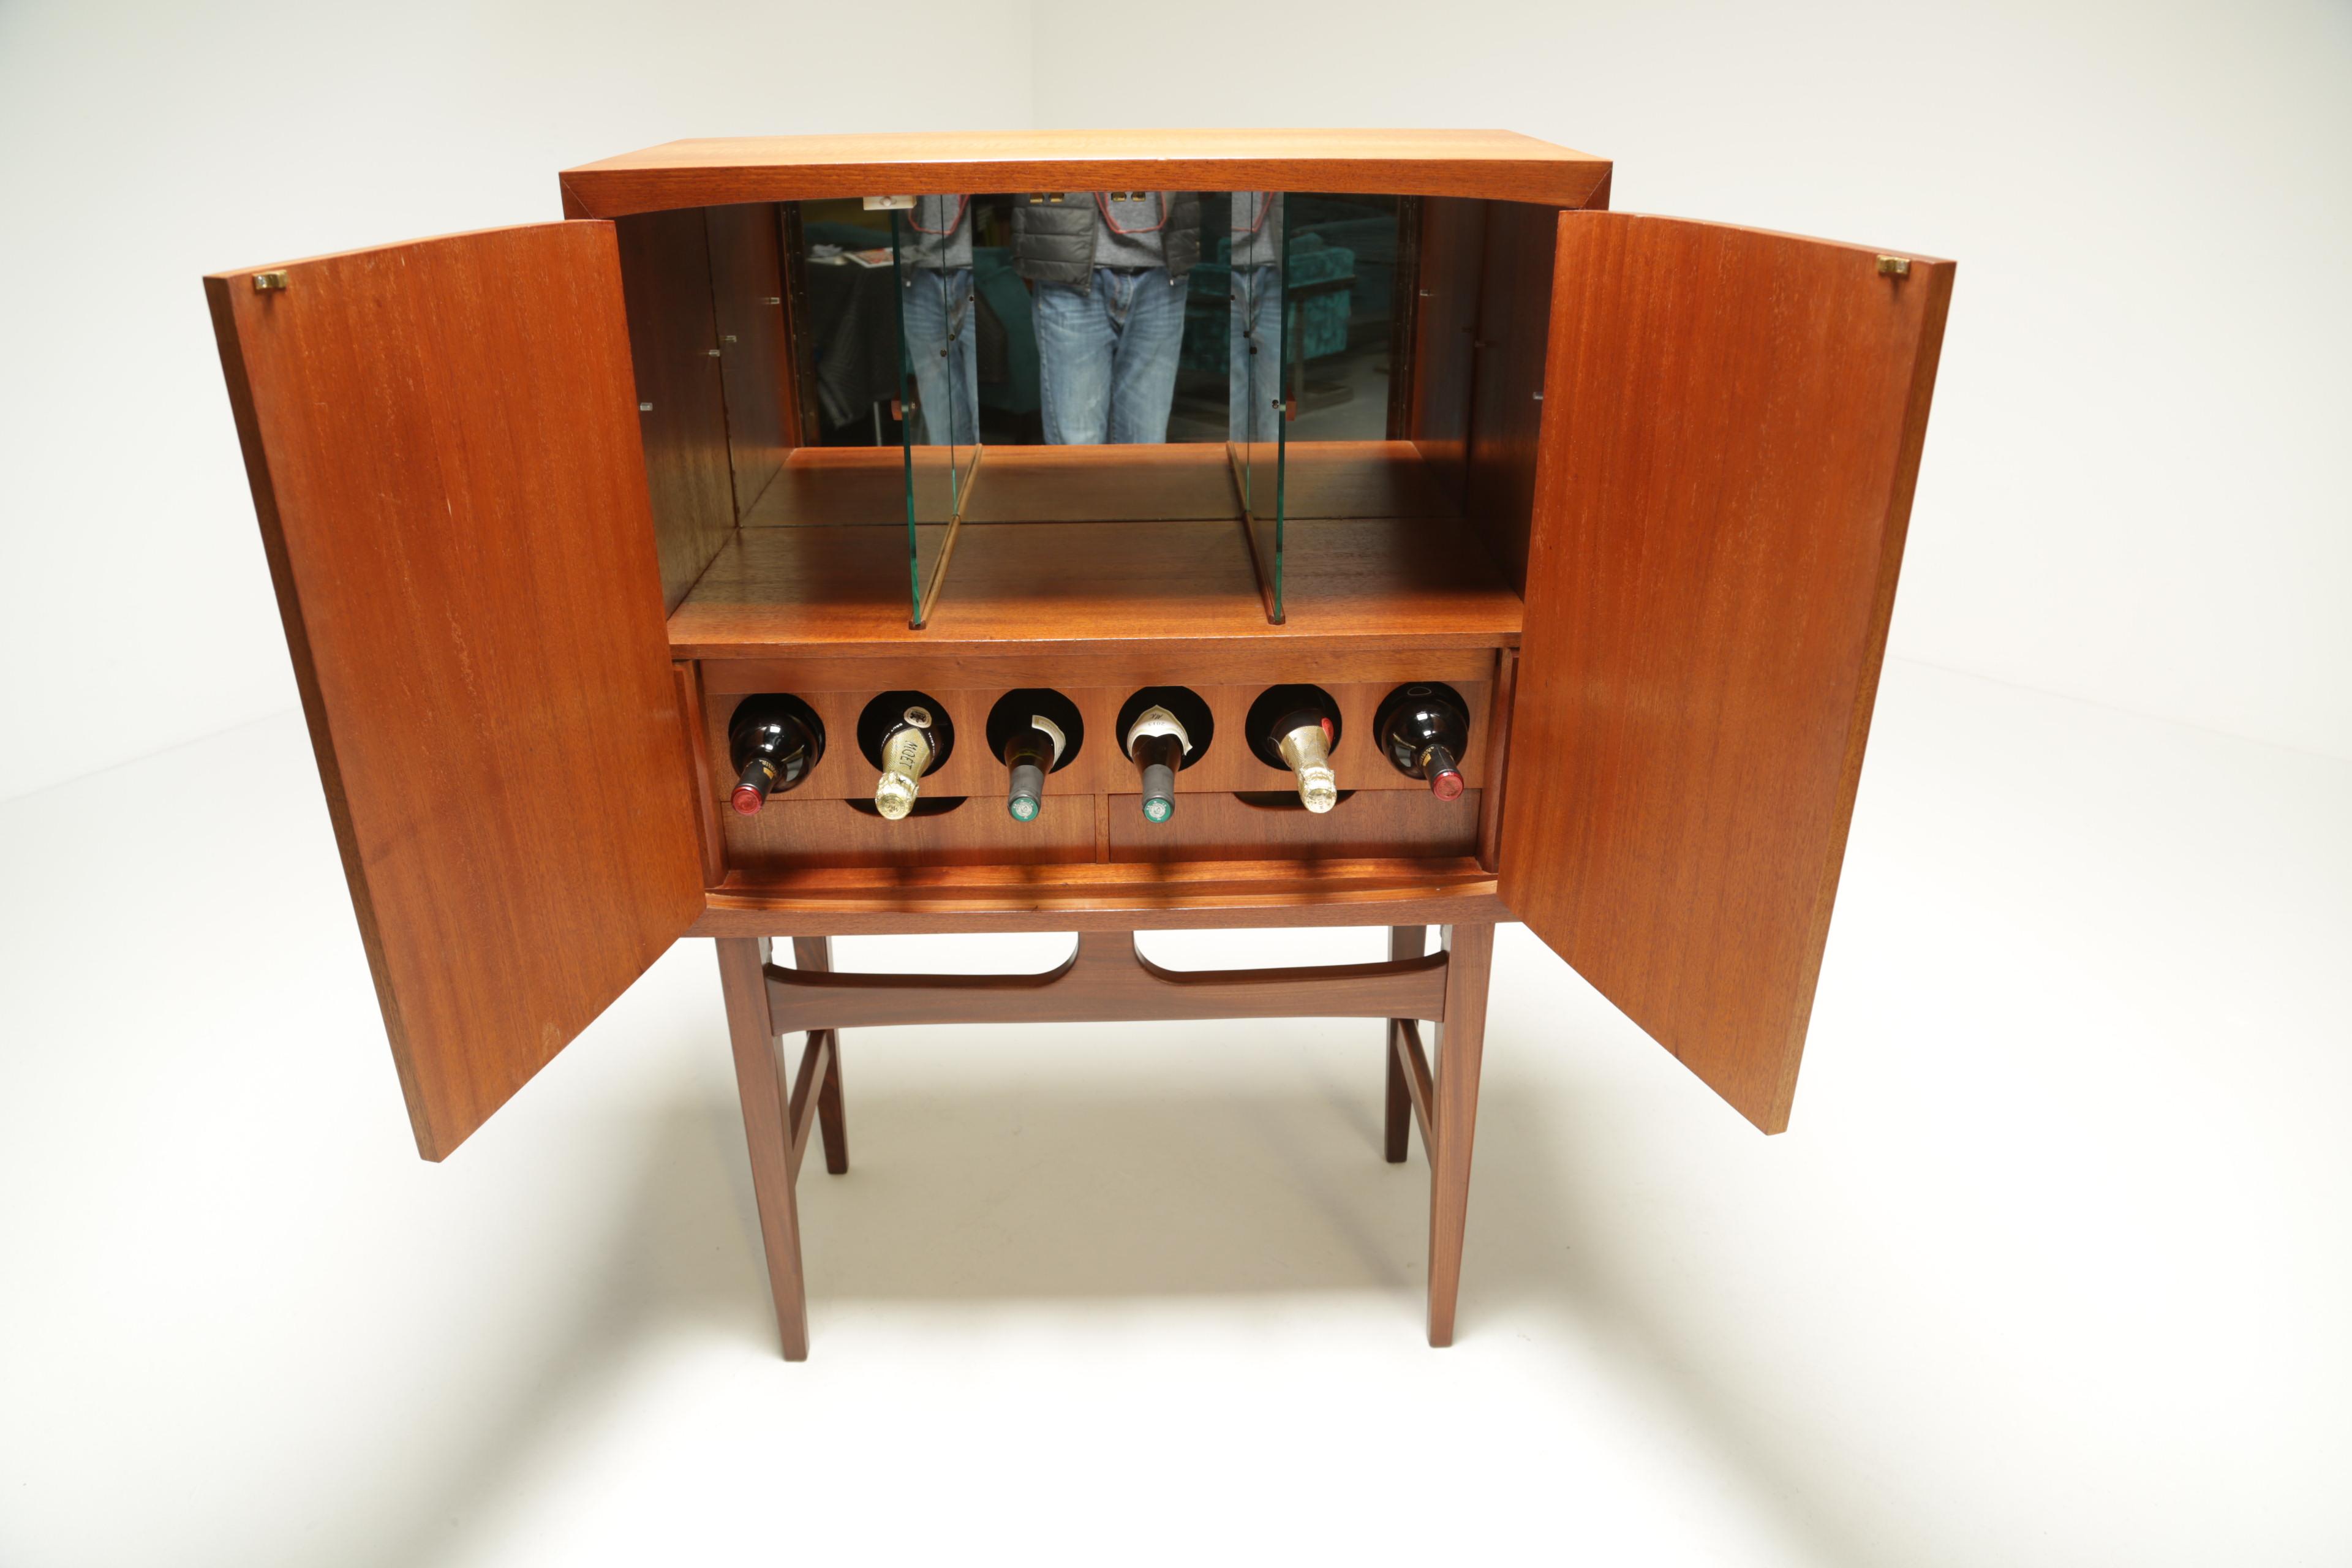 Danish Teak Bar Cabinet With Internal Light And Glass Shelving